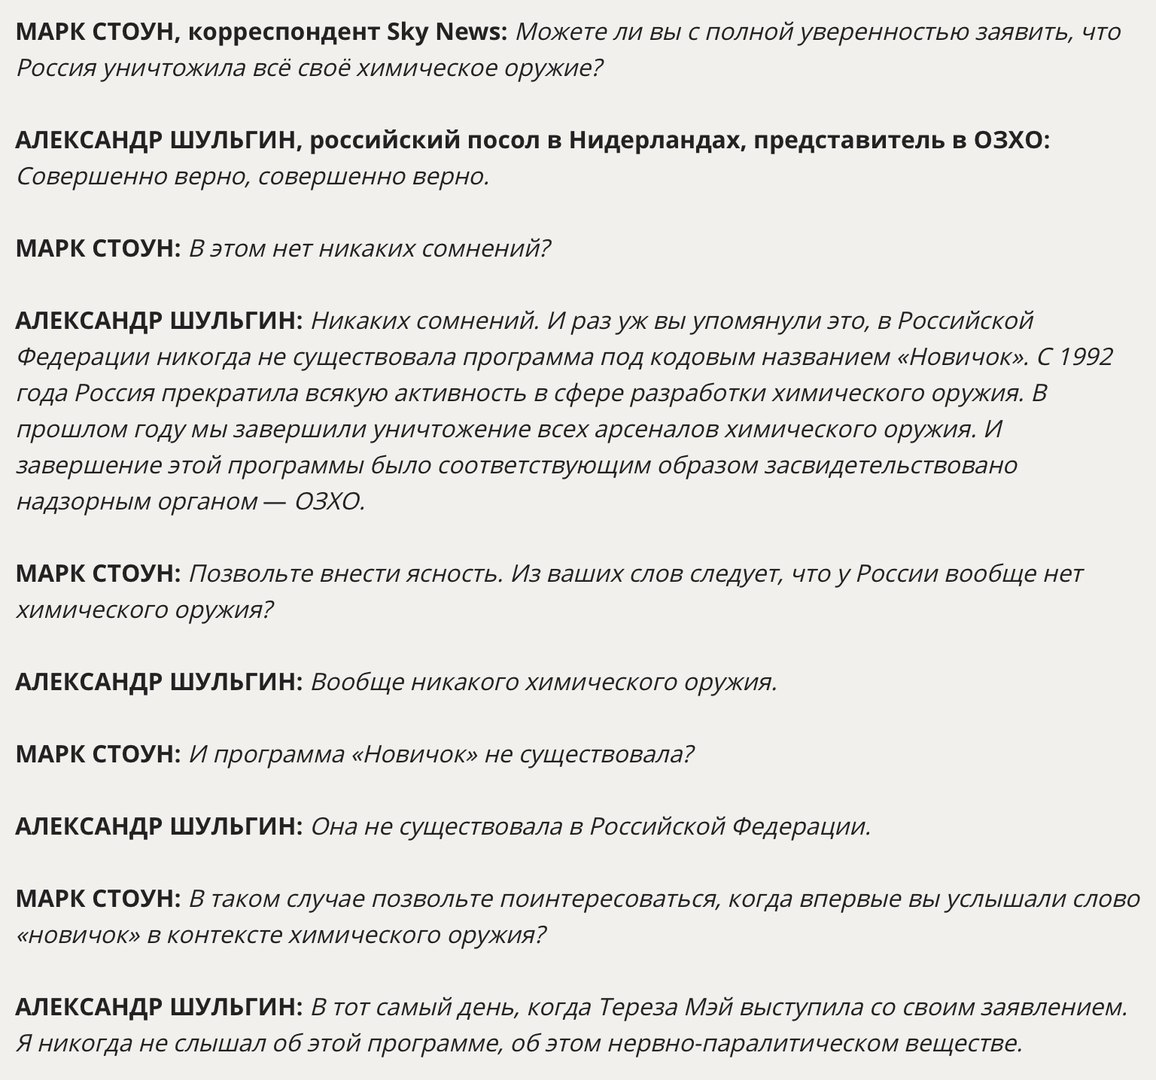 Захарова опровергла существование химоружия под названием Новичок